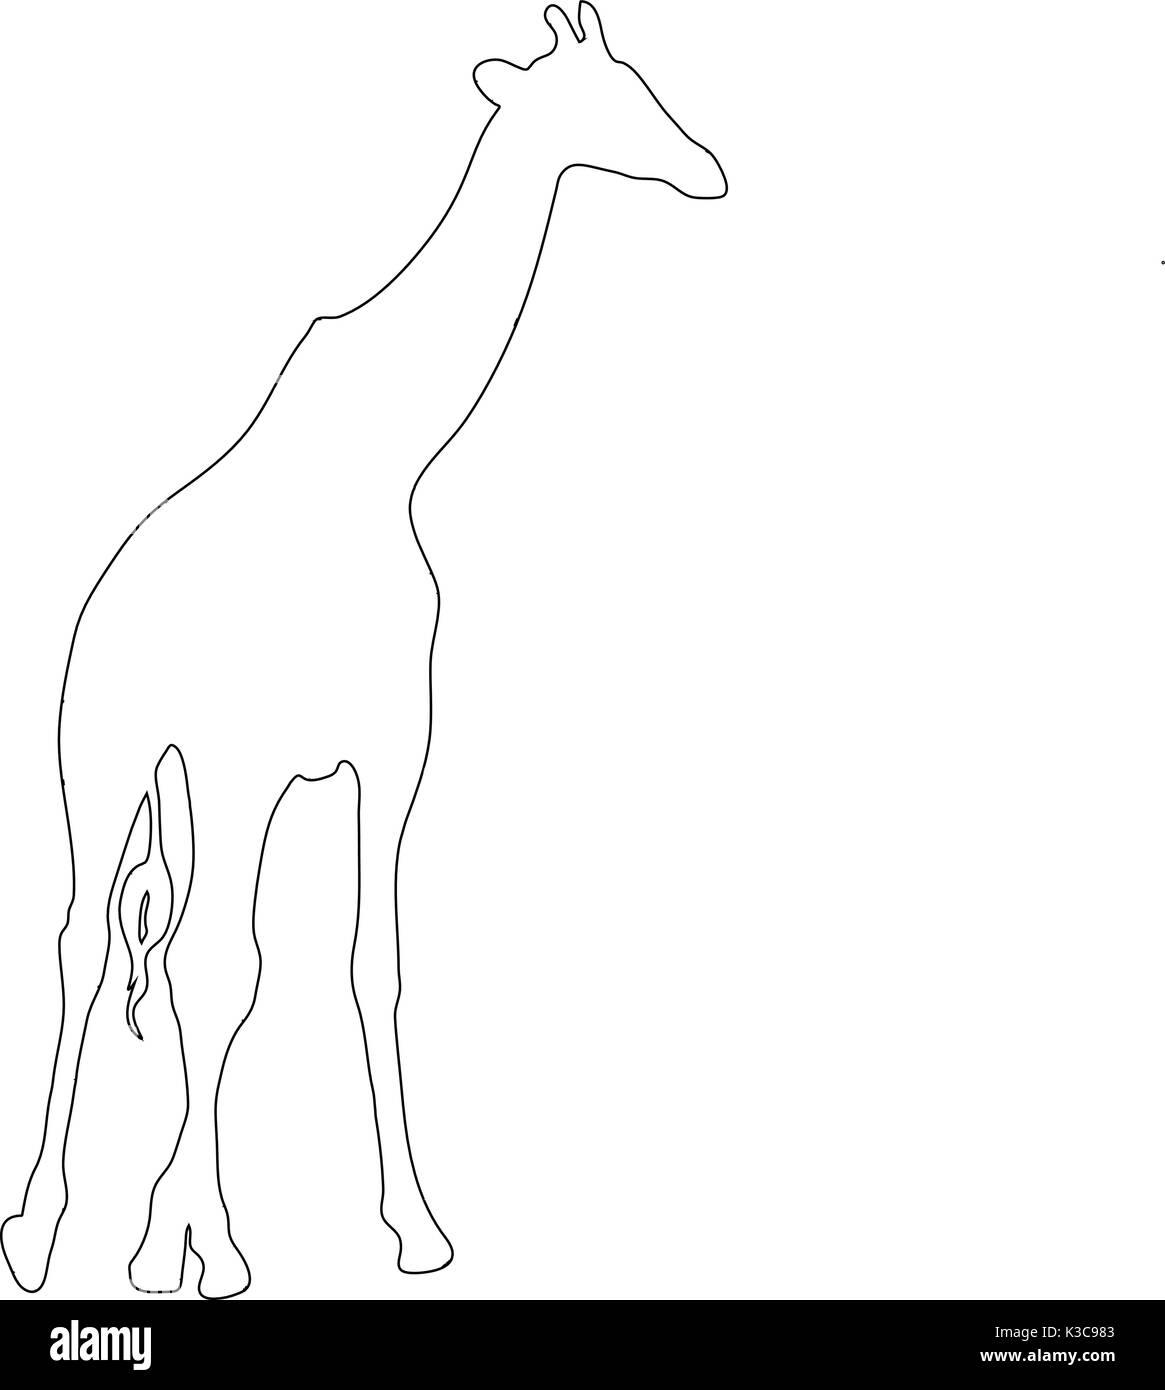 giraffe silhouette outline stock photos u0026 giraffe silhouette